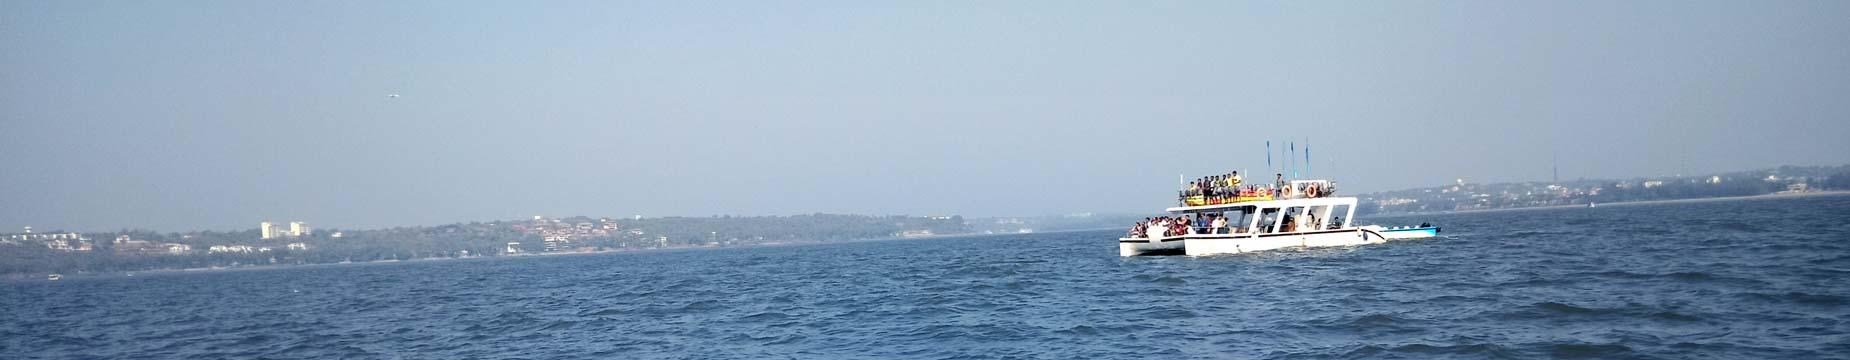 boat-cruise-trip-goa-panjim